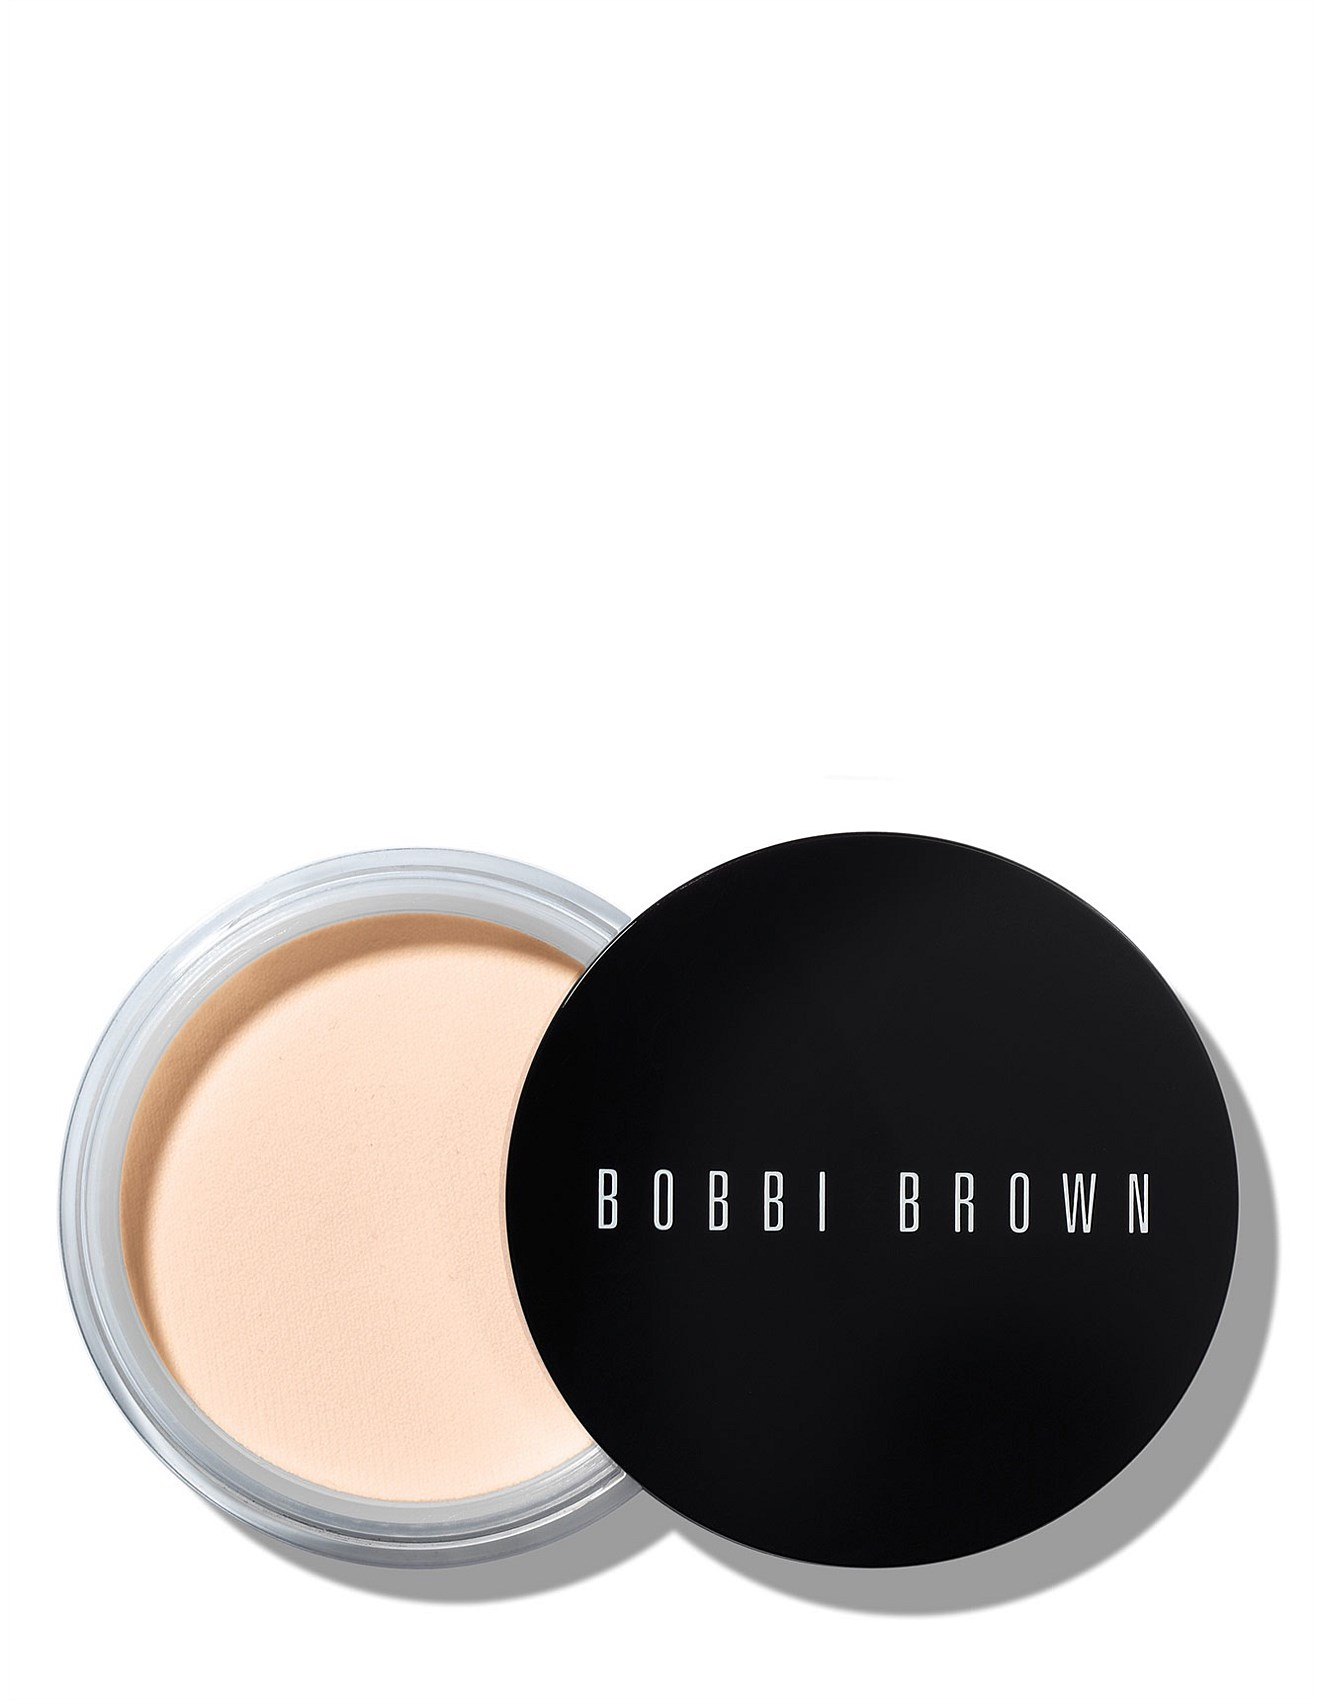 bobbi brown makeup application david jones